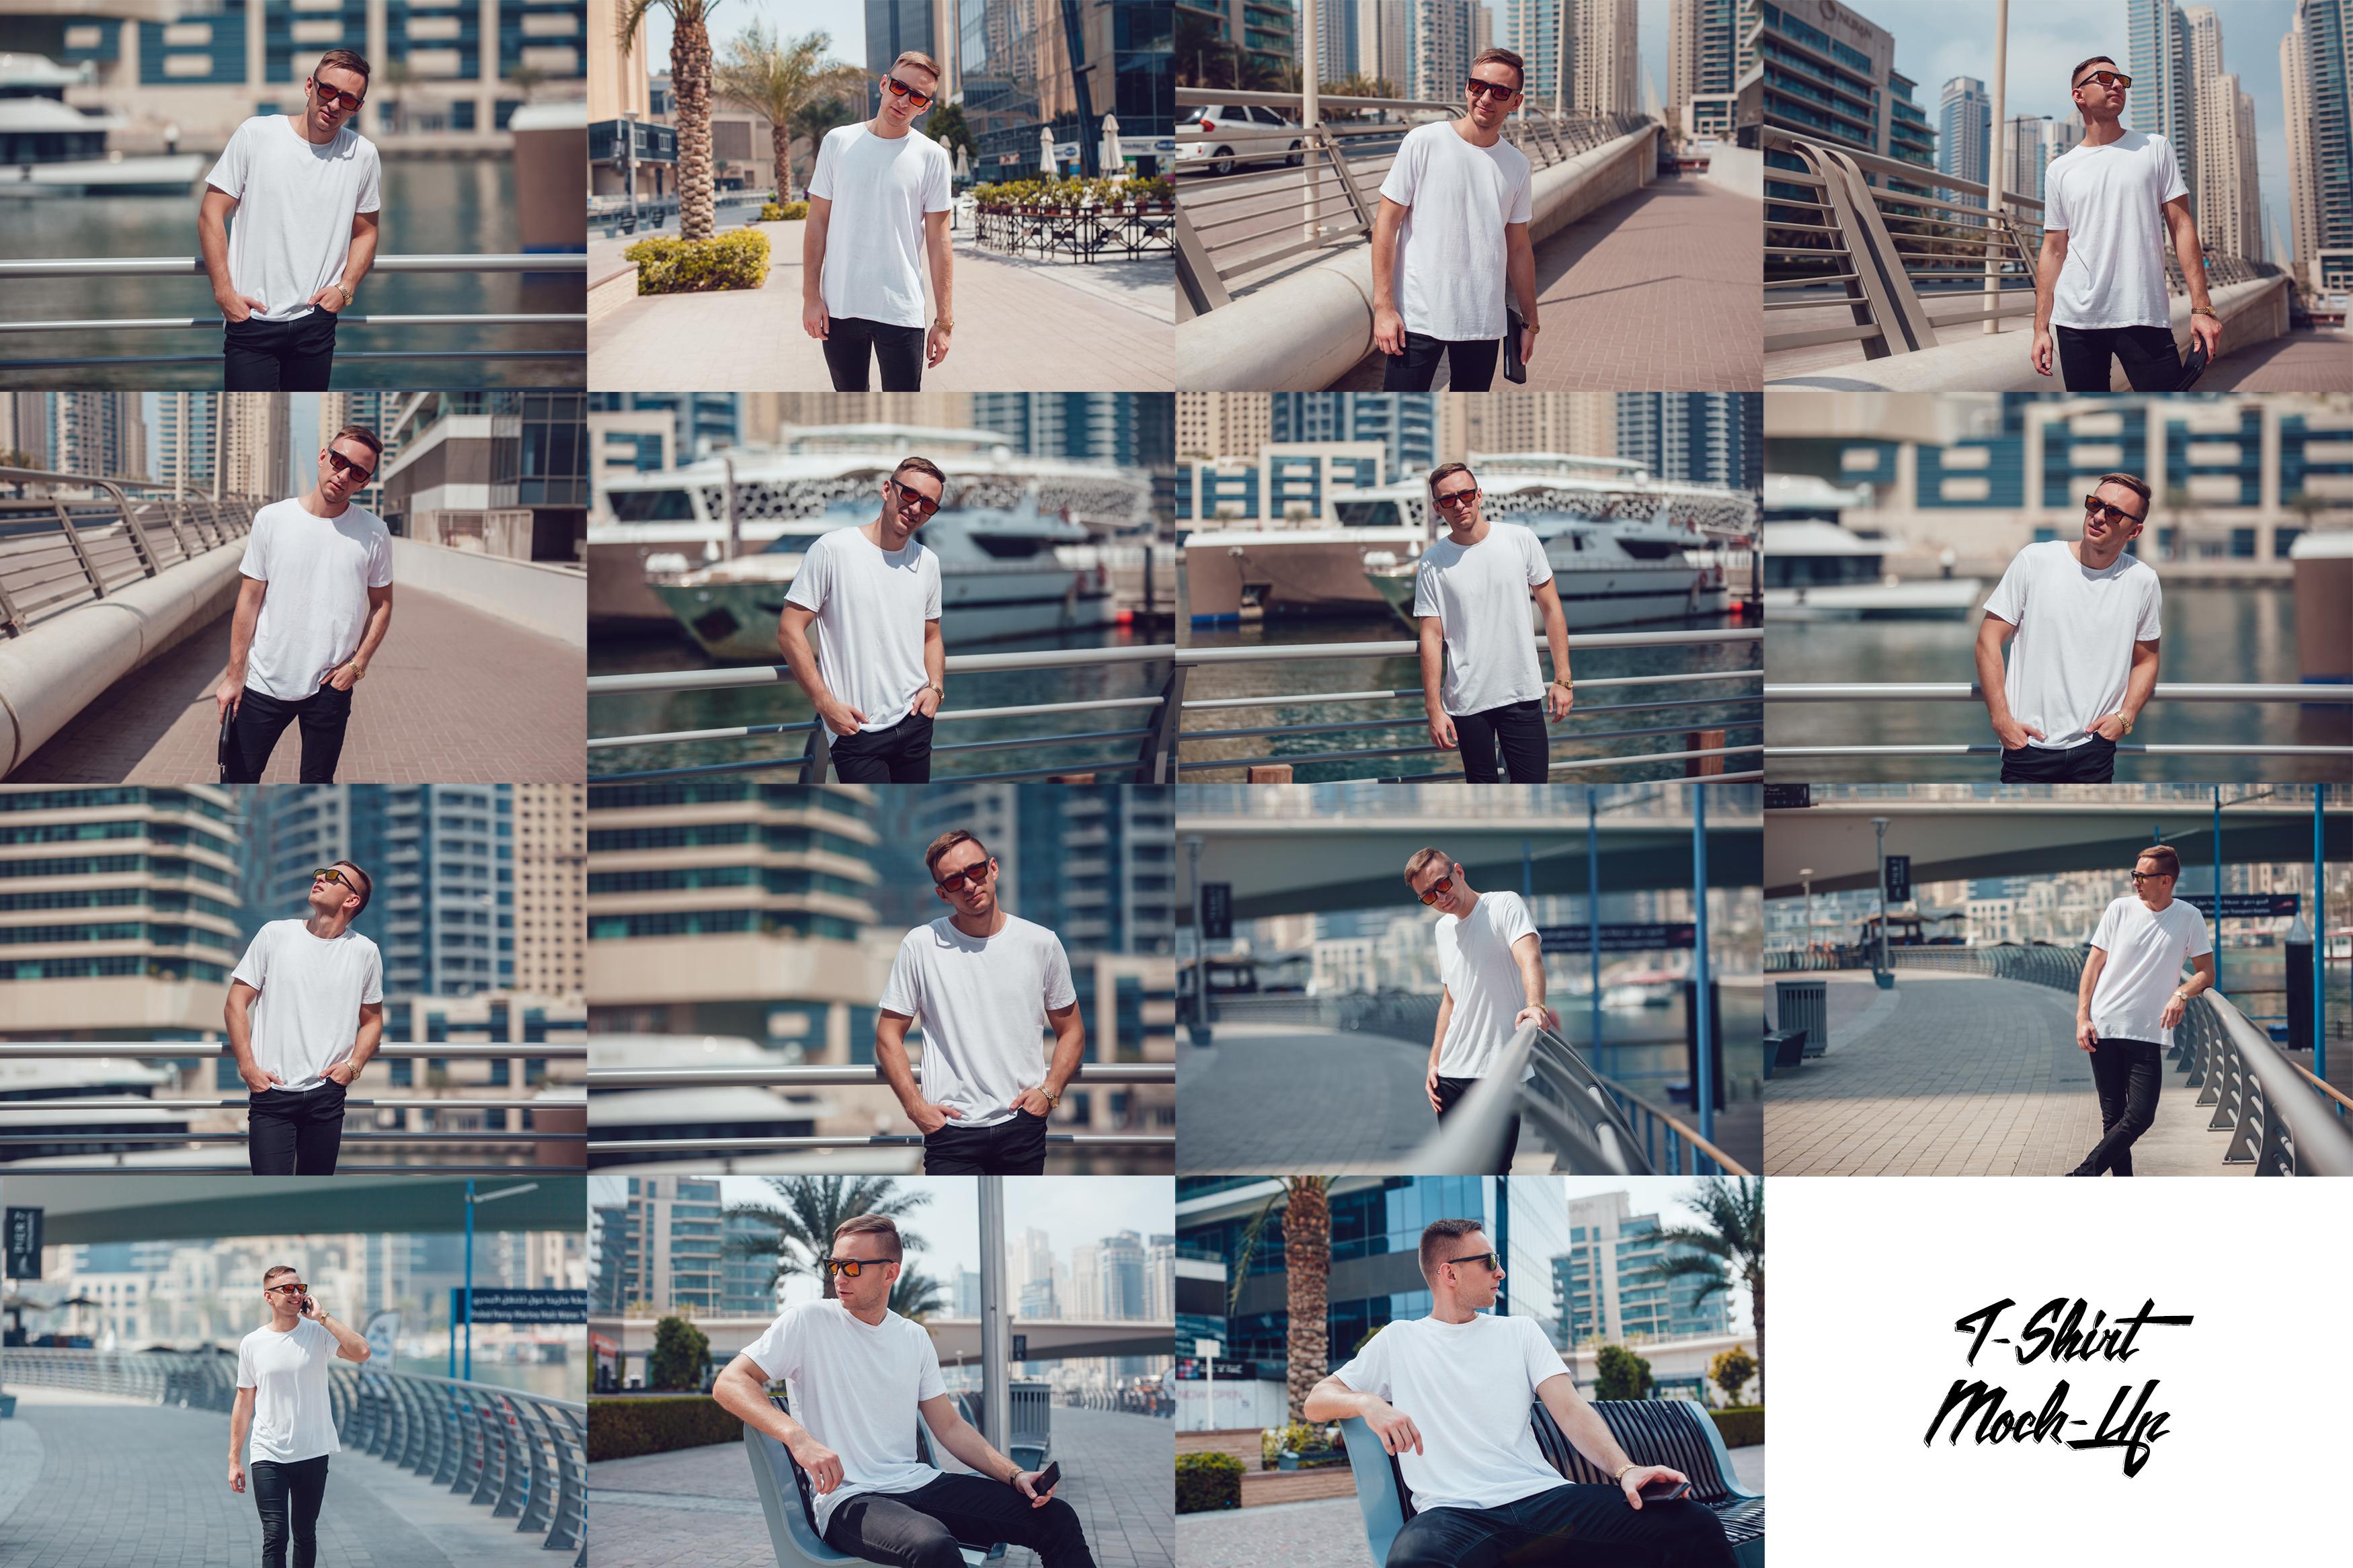 Men's T-Shirt Mock-Up Vol.5 2017 example image 2